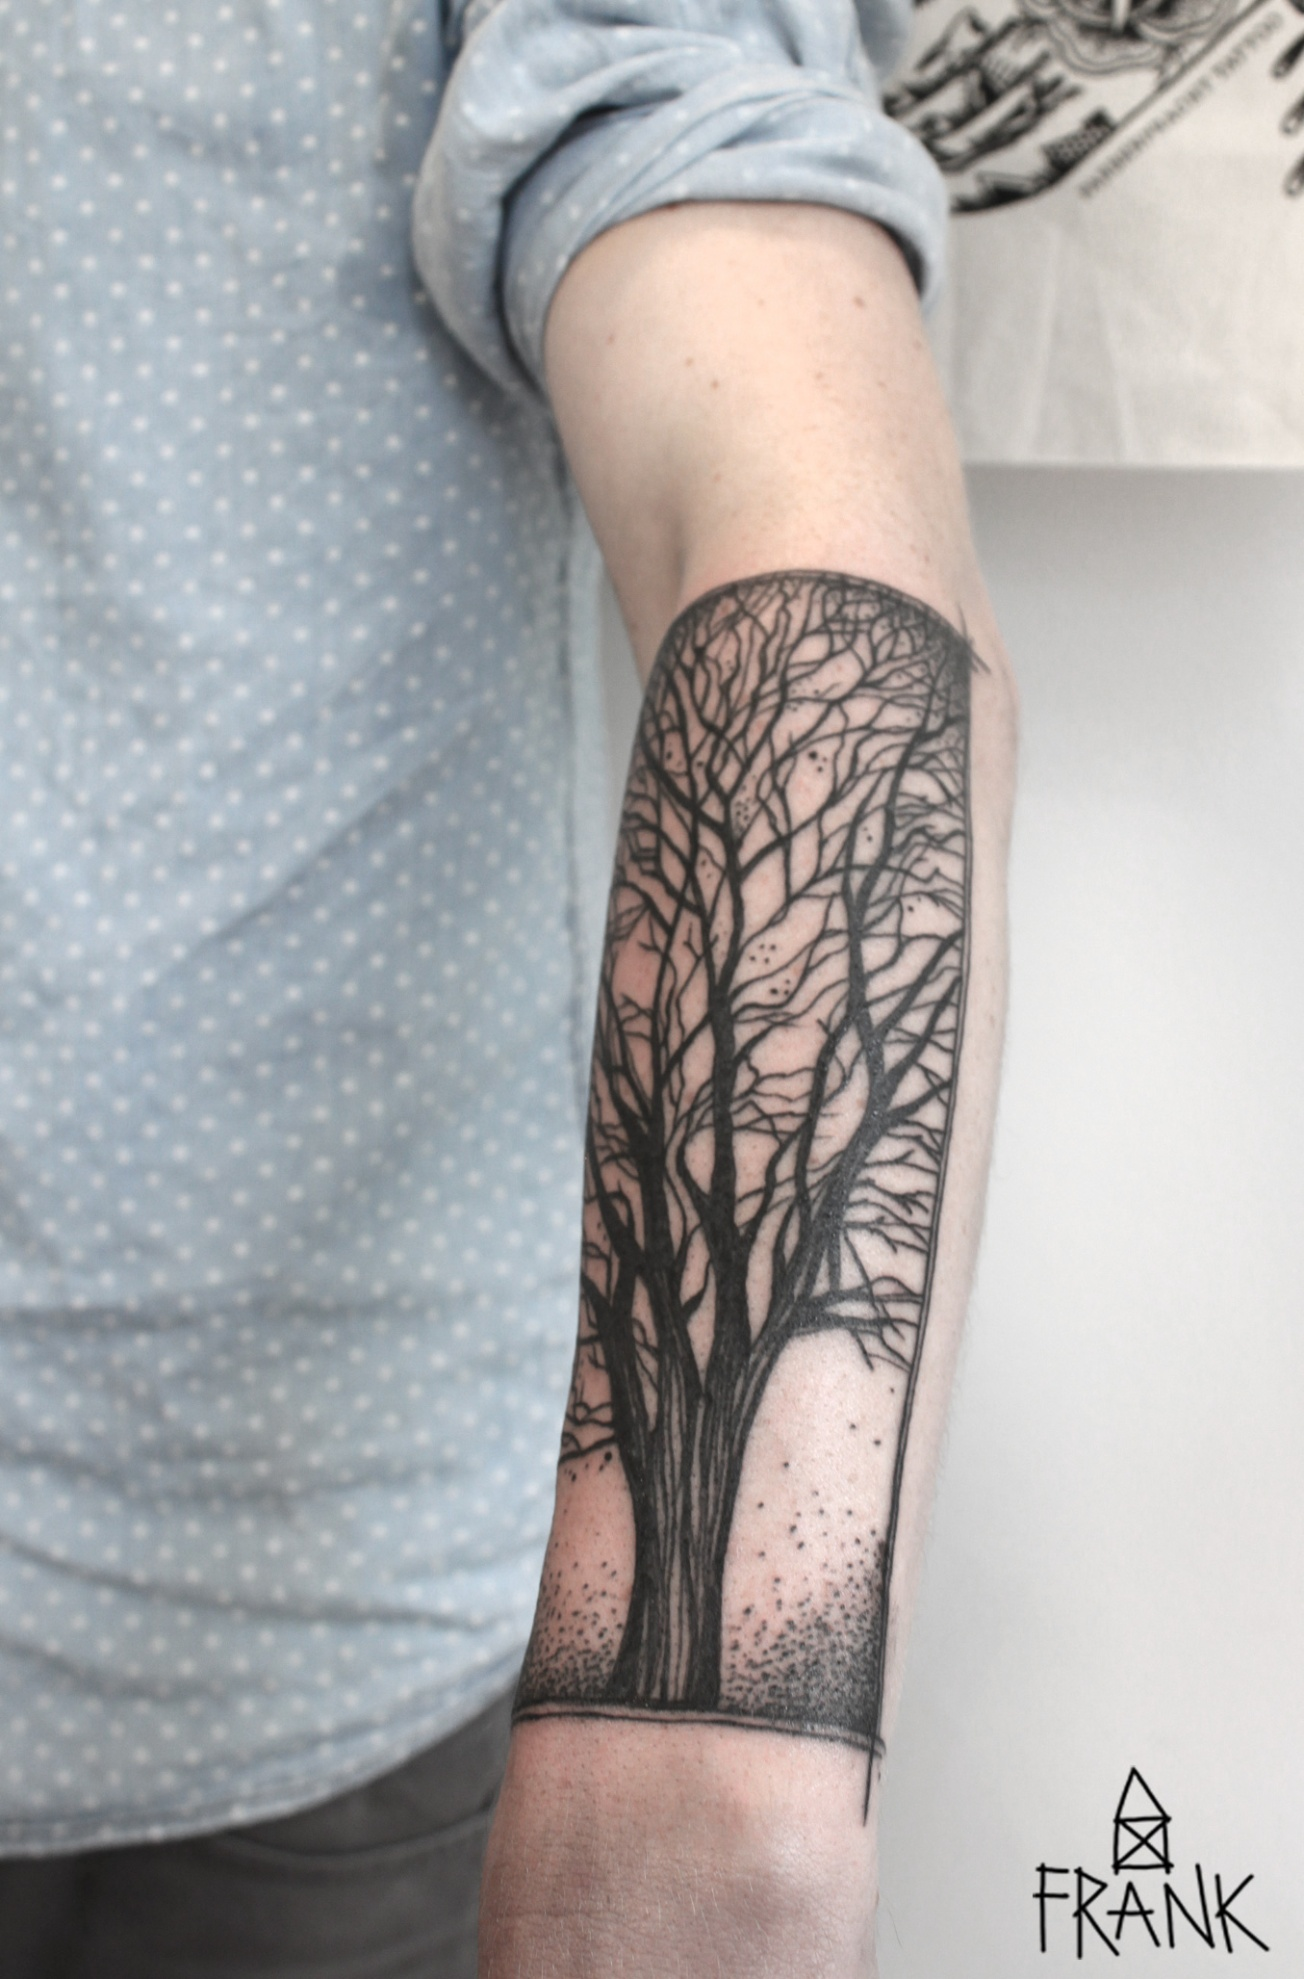 Miriam_Frank_Tattoo_tree_baum_fuchs_2